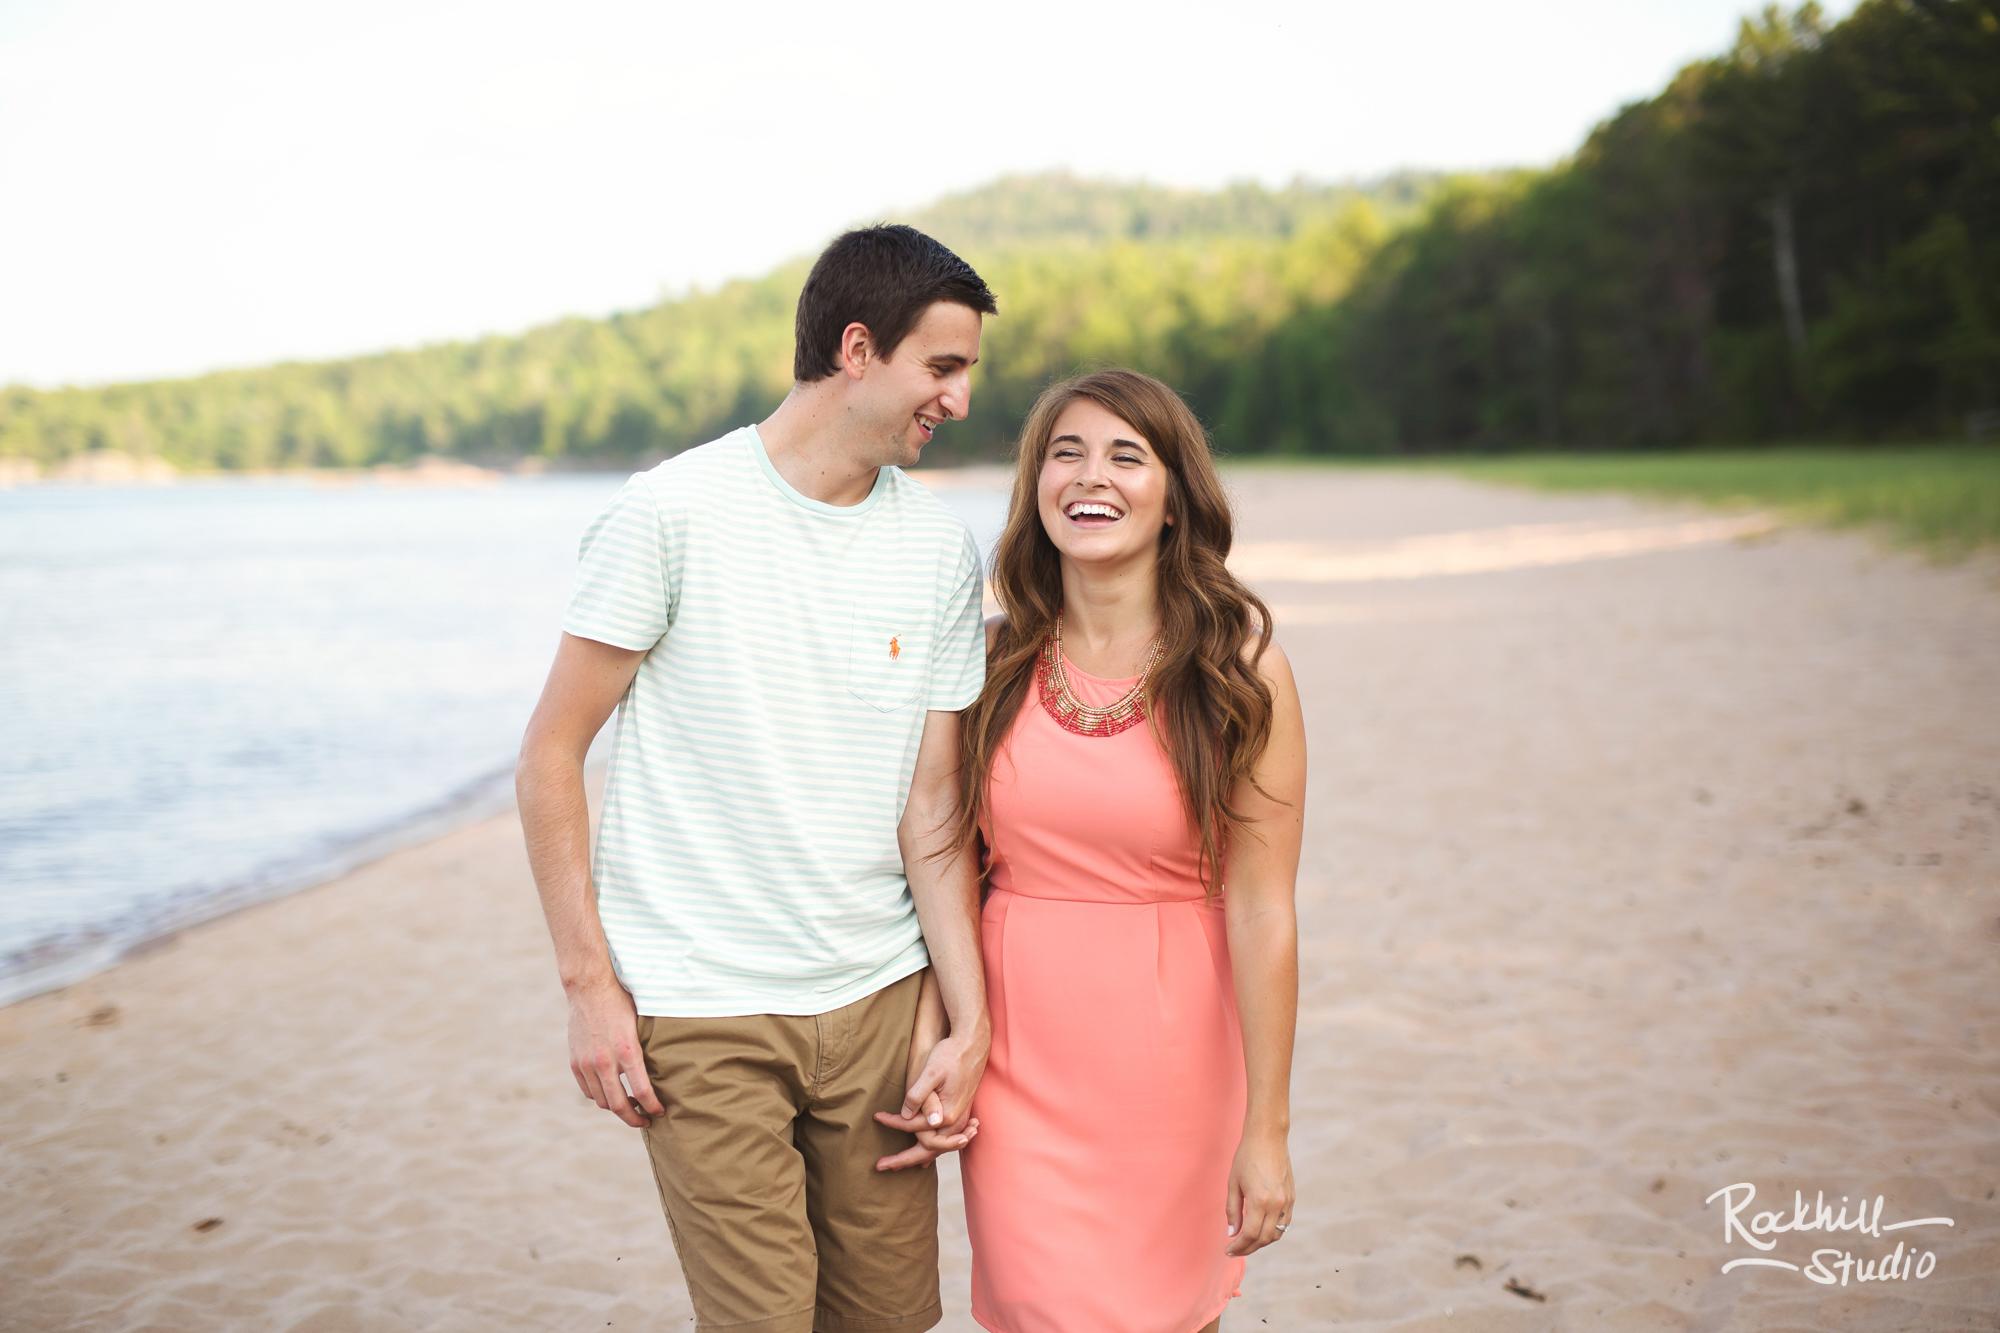 rockhill-studio-marquette-michigan-upper-peninsula-engagement-photographer-wetmore-landing-lake-superior-wedding-20.jpg